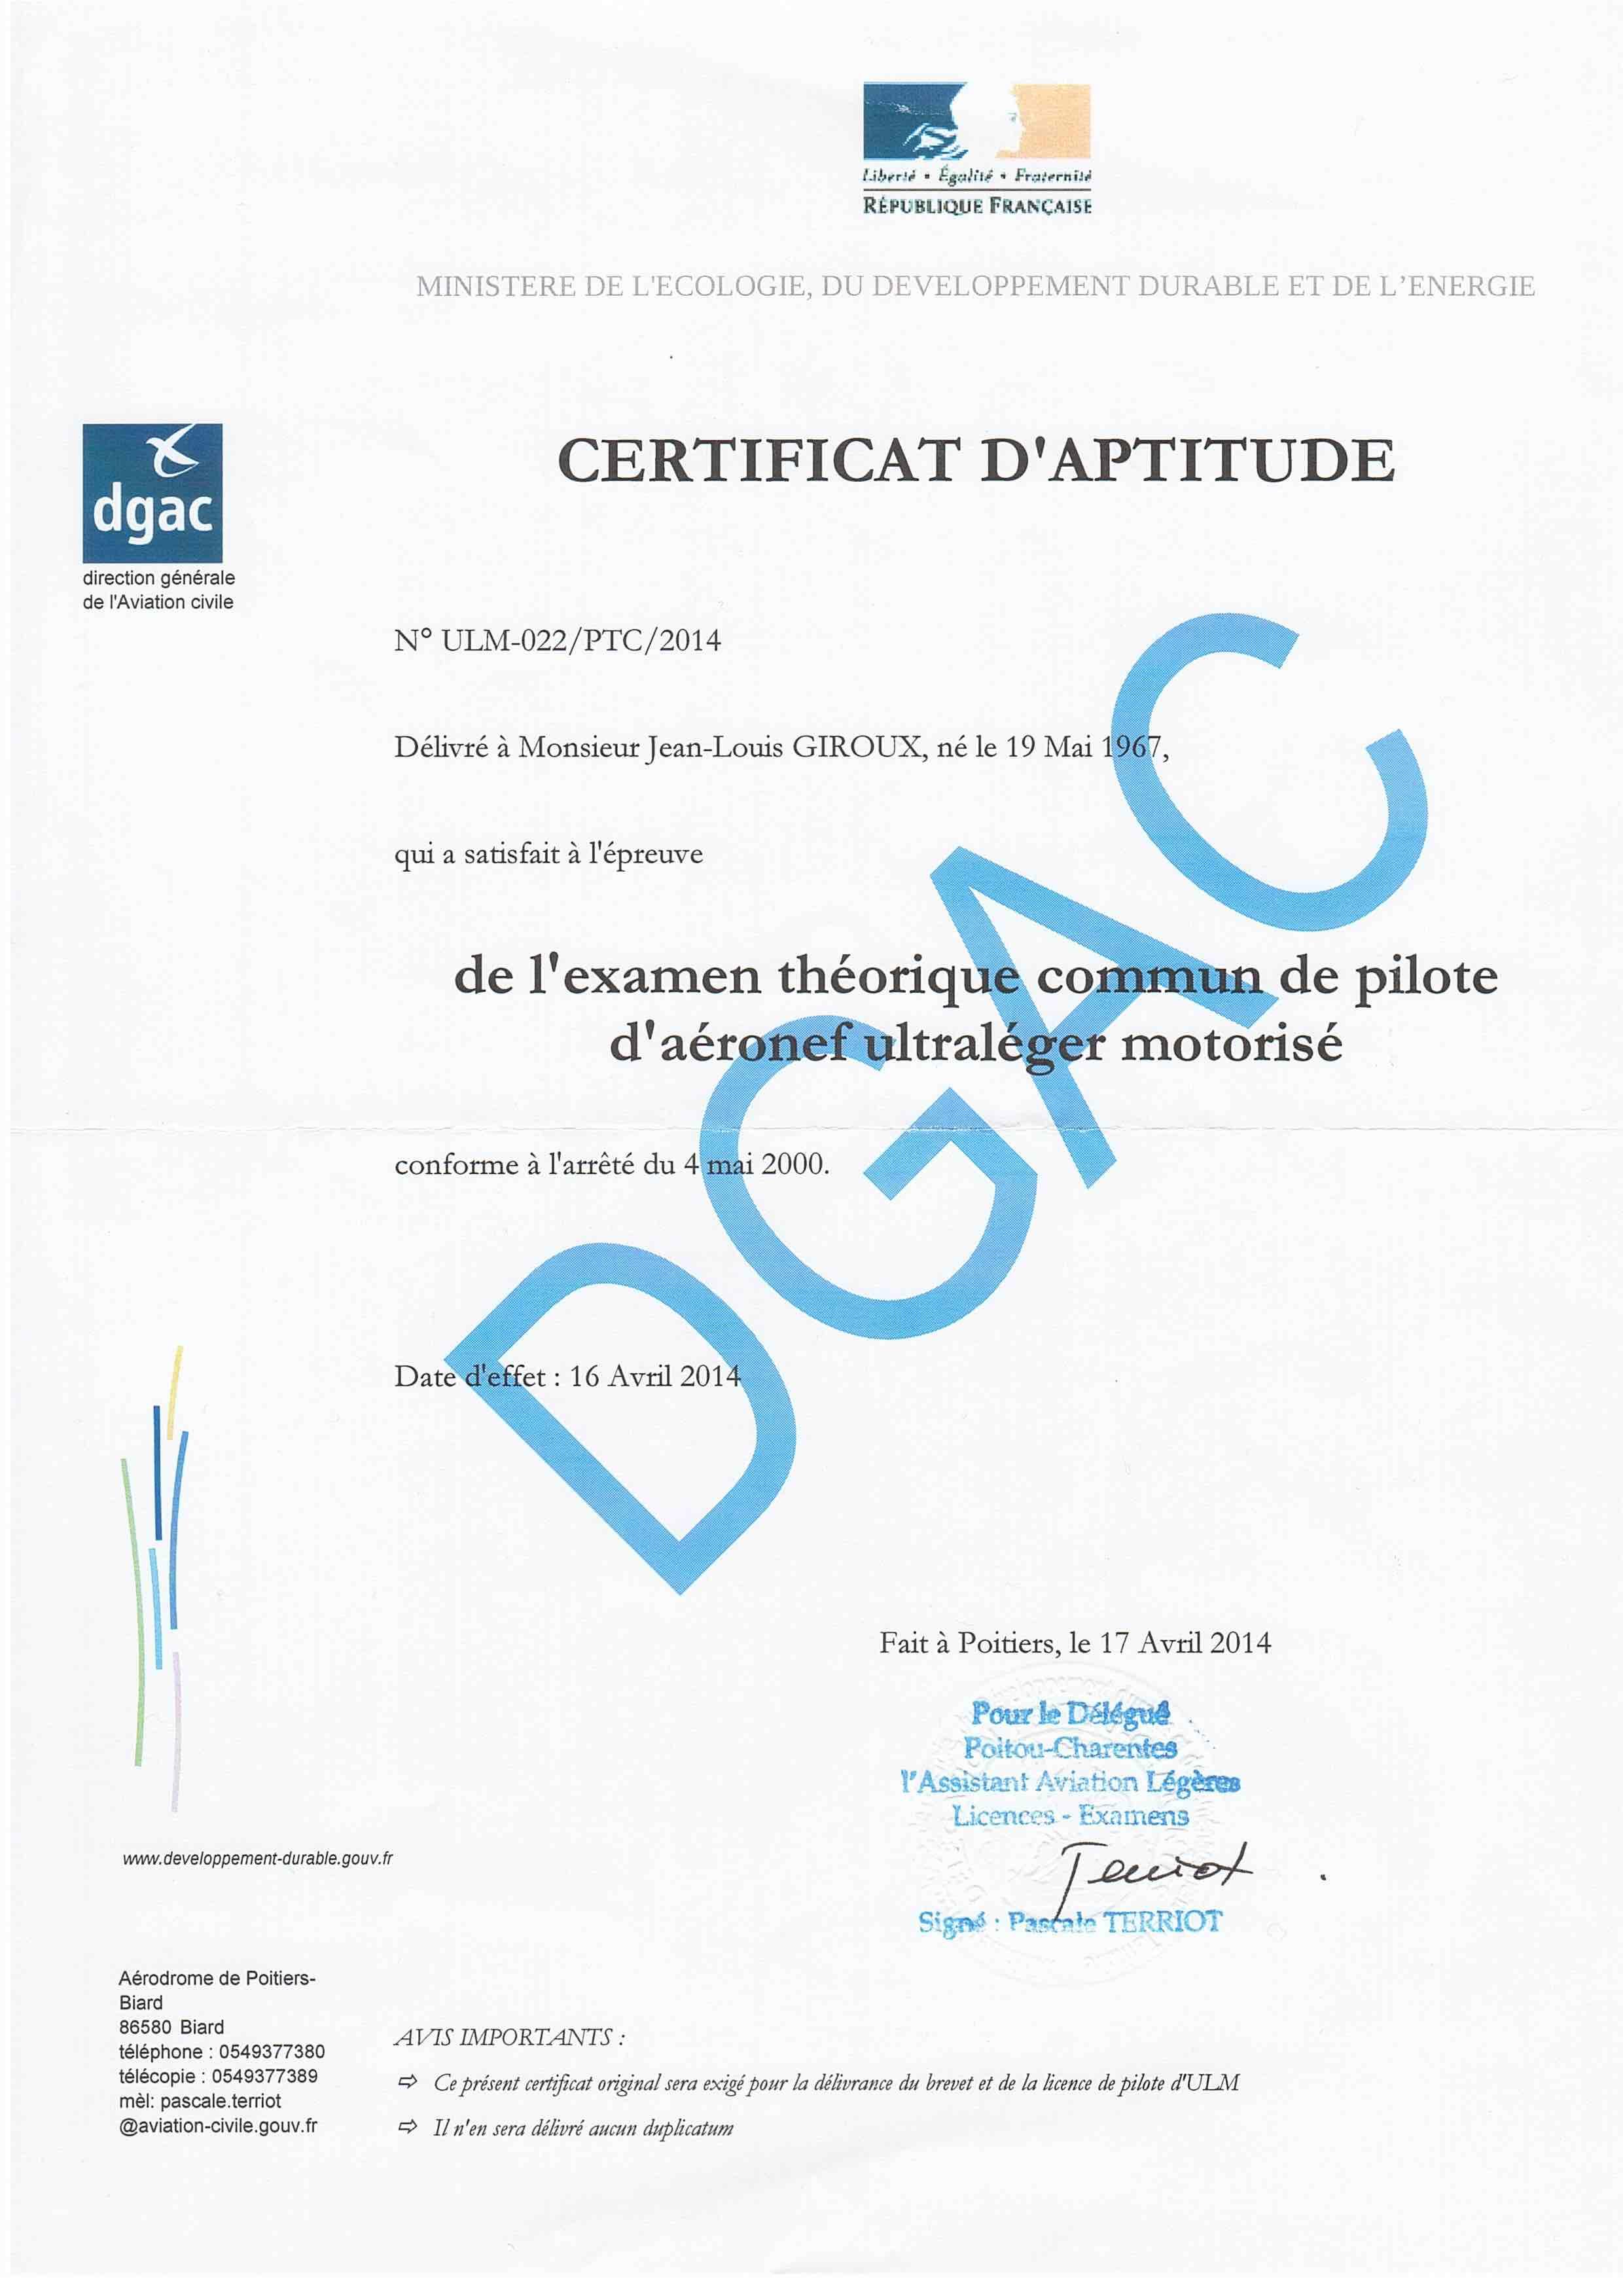 Certif_aptitude_DGAC